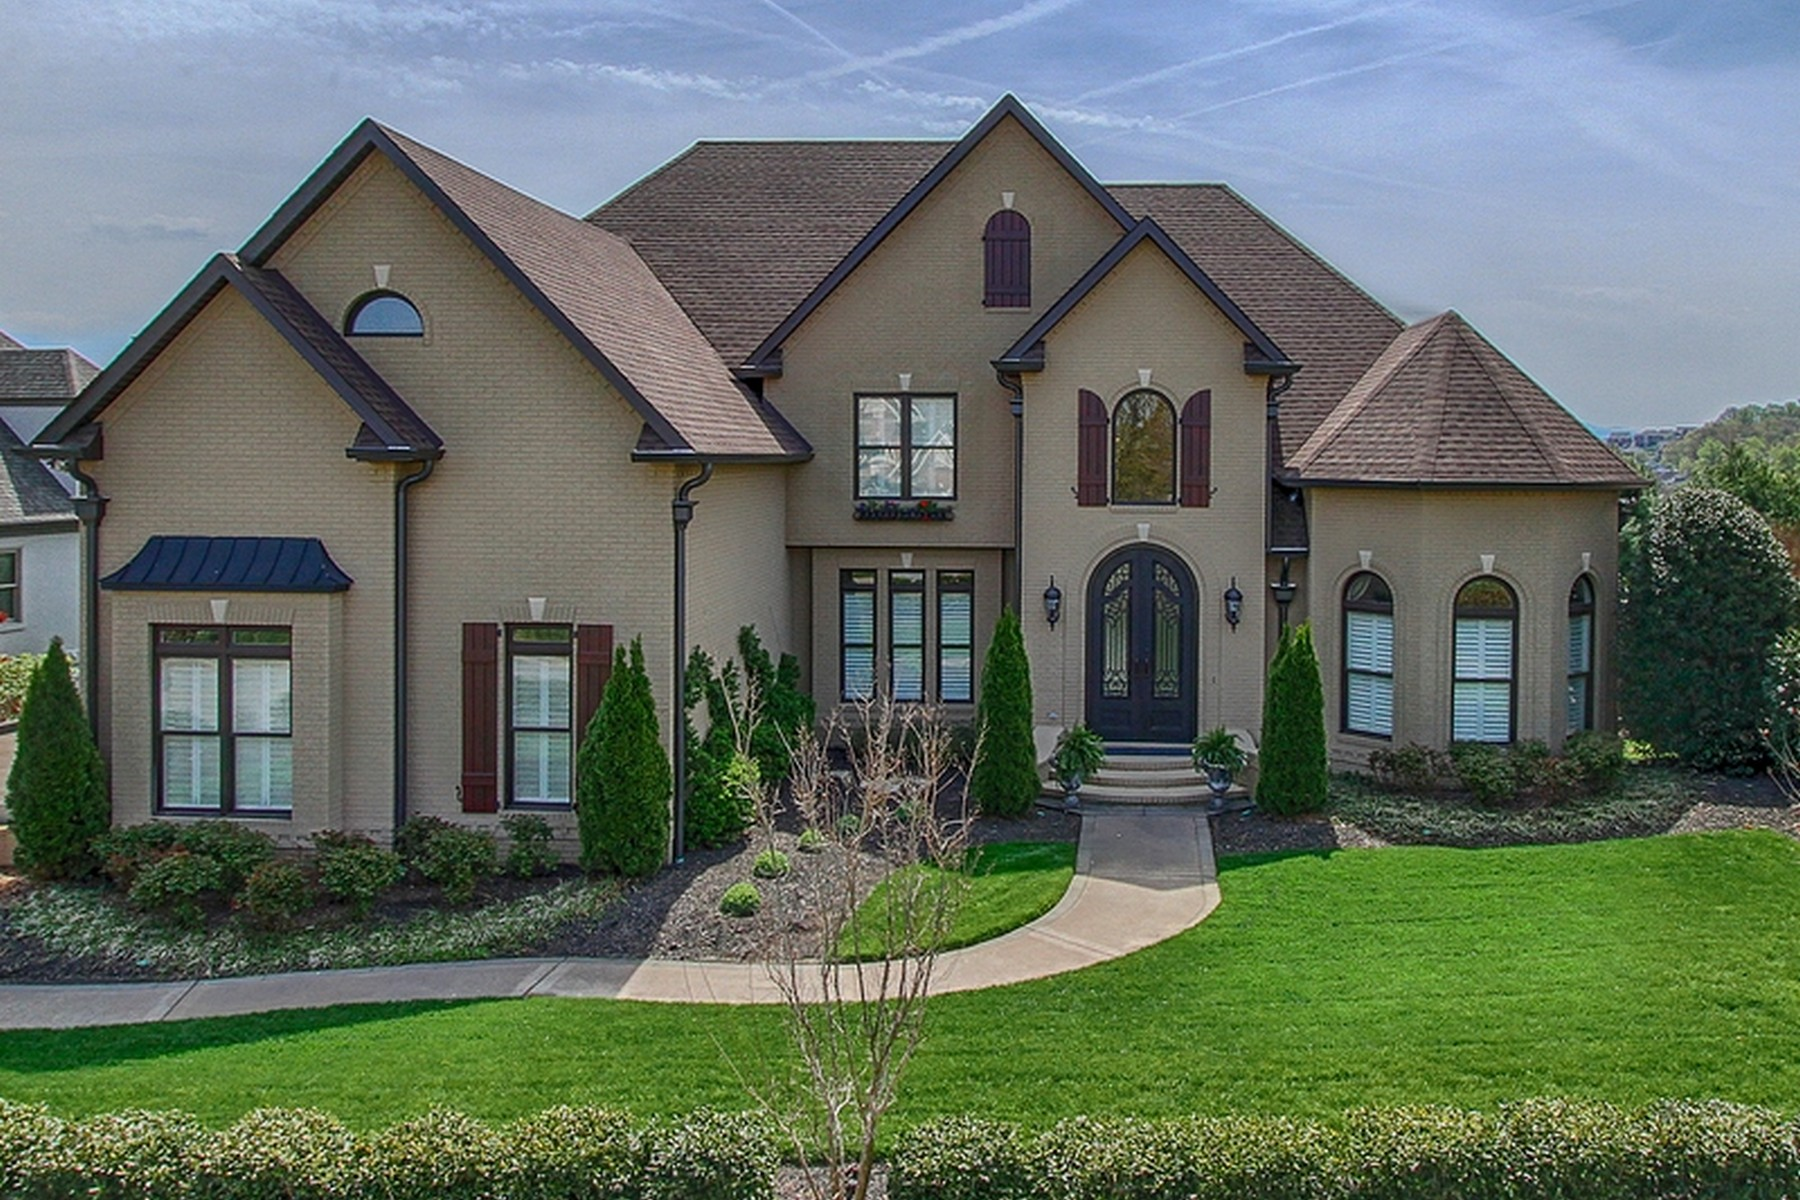 Moradia para Venda às Magnificent Home for Entertaining at Gettysvue 9238 Linksvue Dr Knoxville, Tennessee, 37922 Estados Unidos